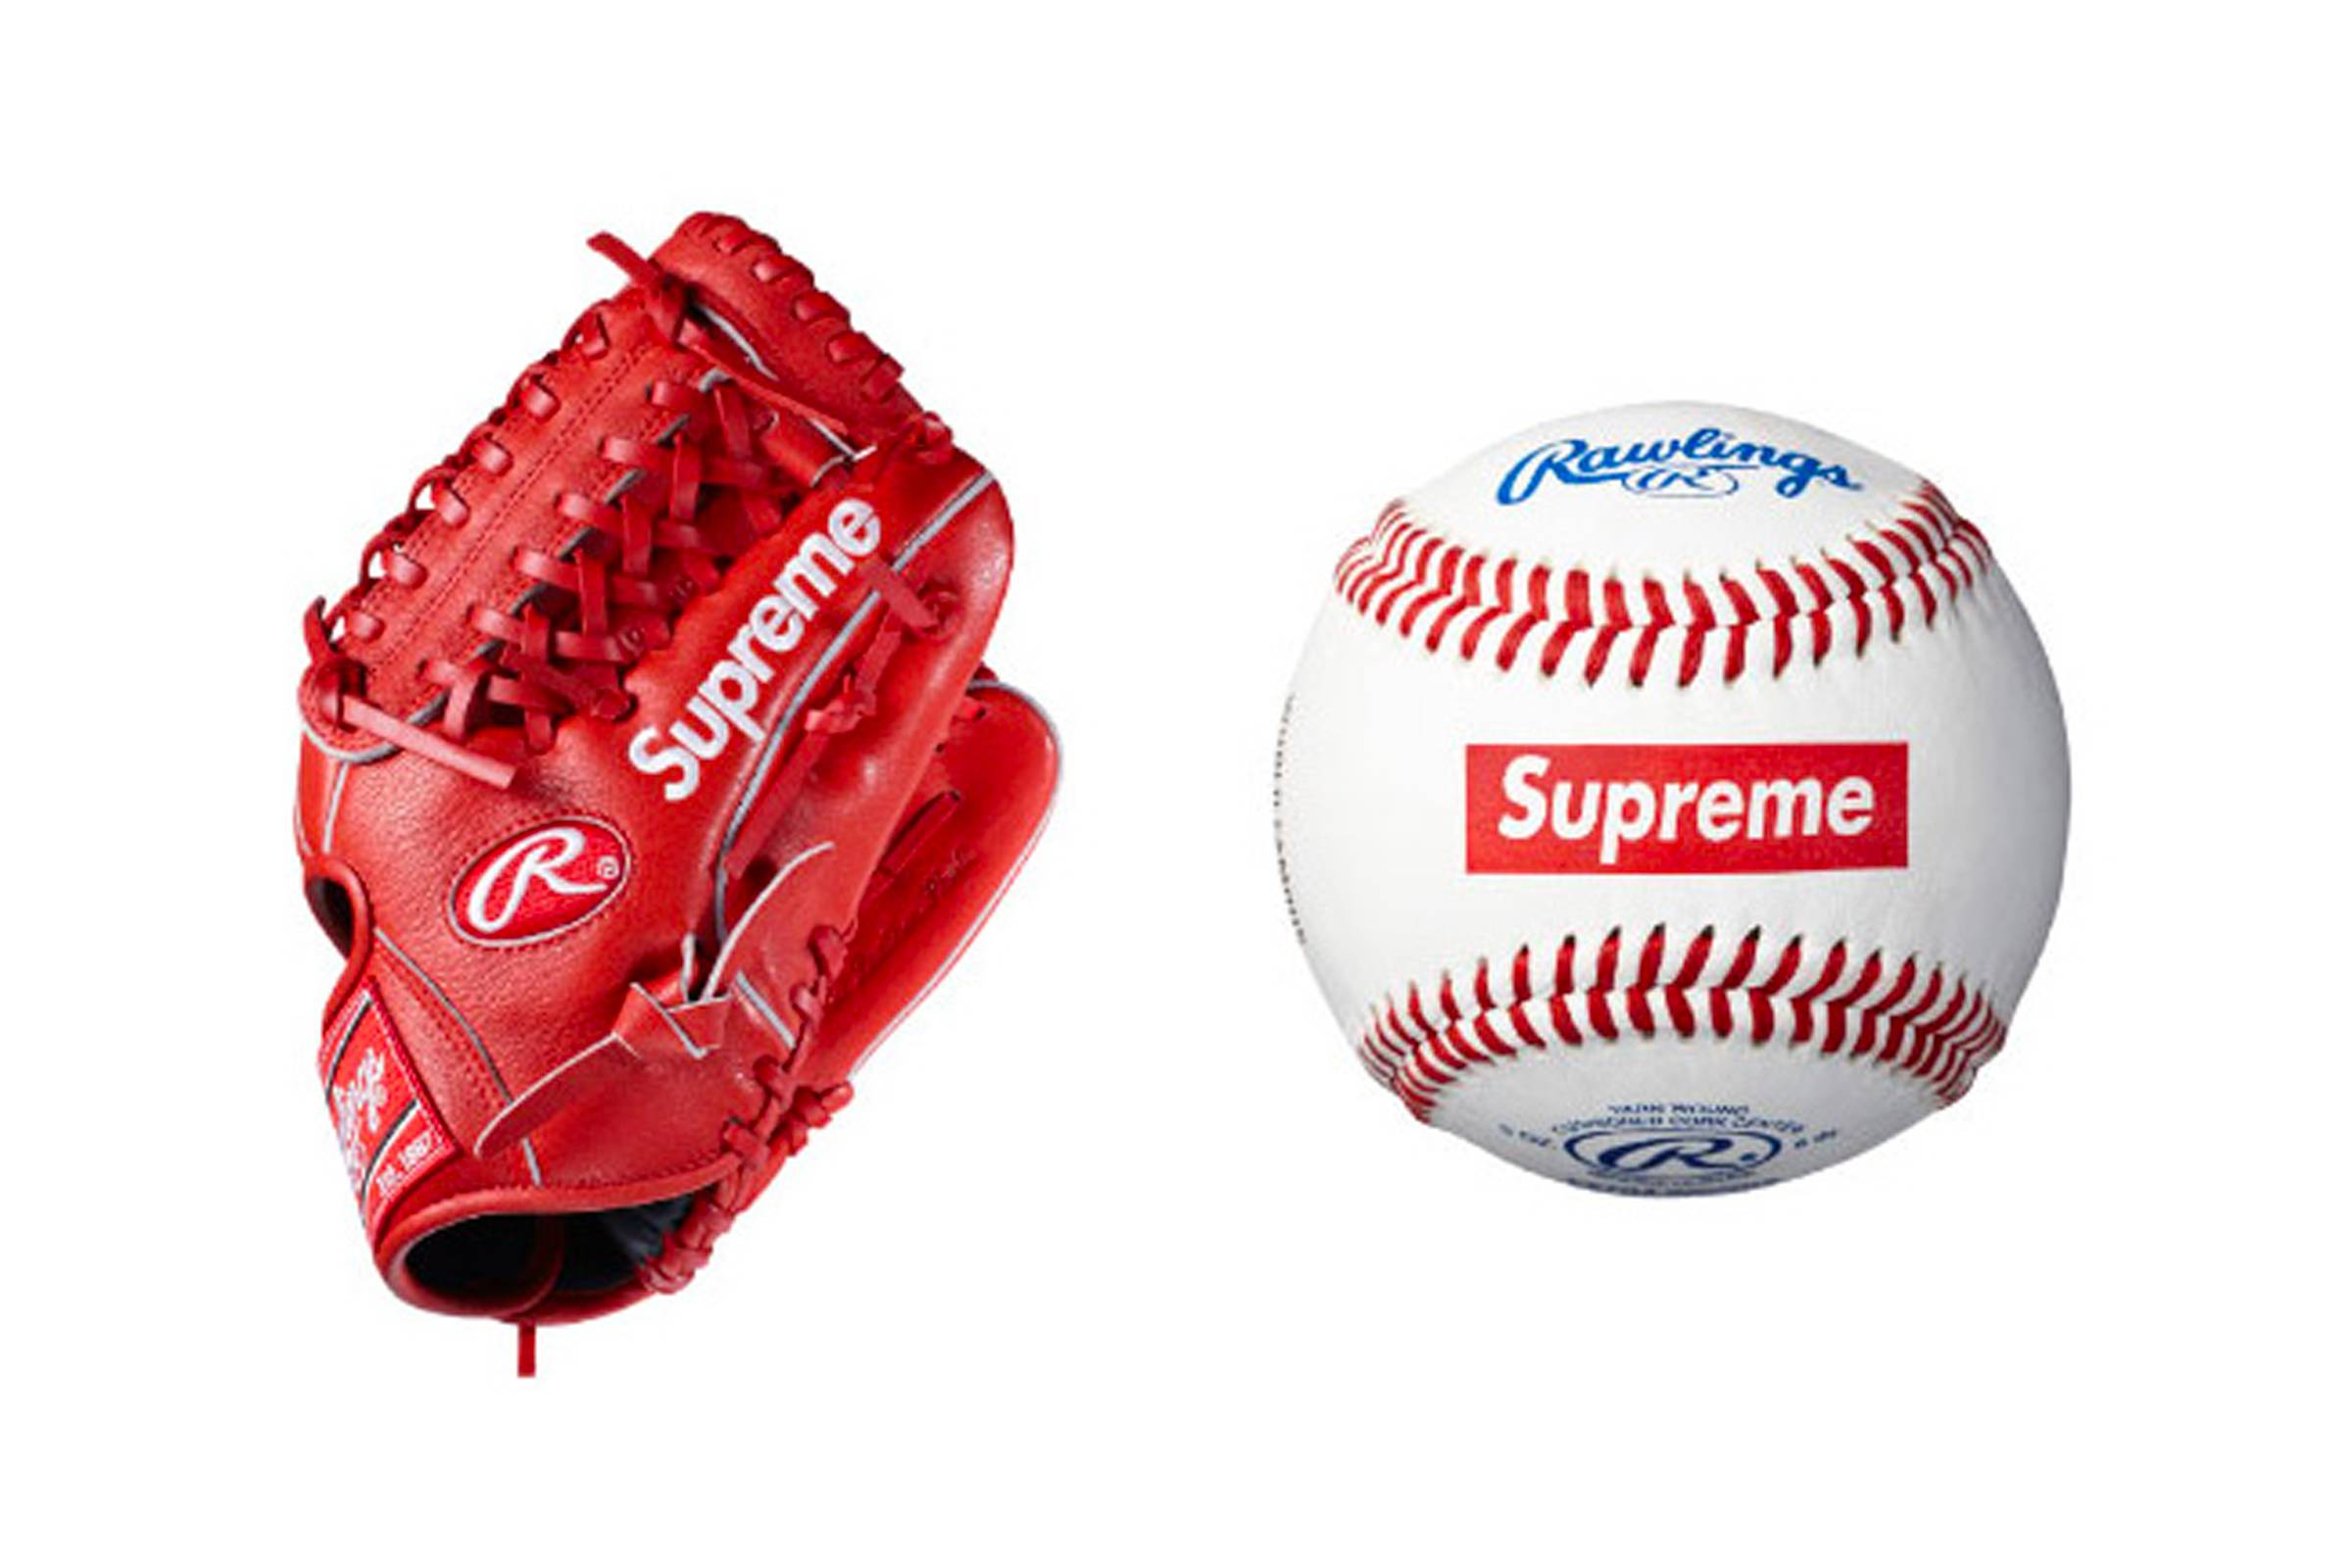 Supreme x Rawlings Baseball and Baseball Glove (Spring/Summer 2012)